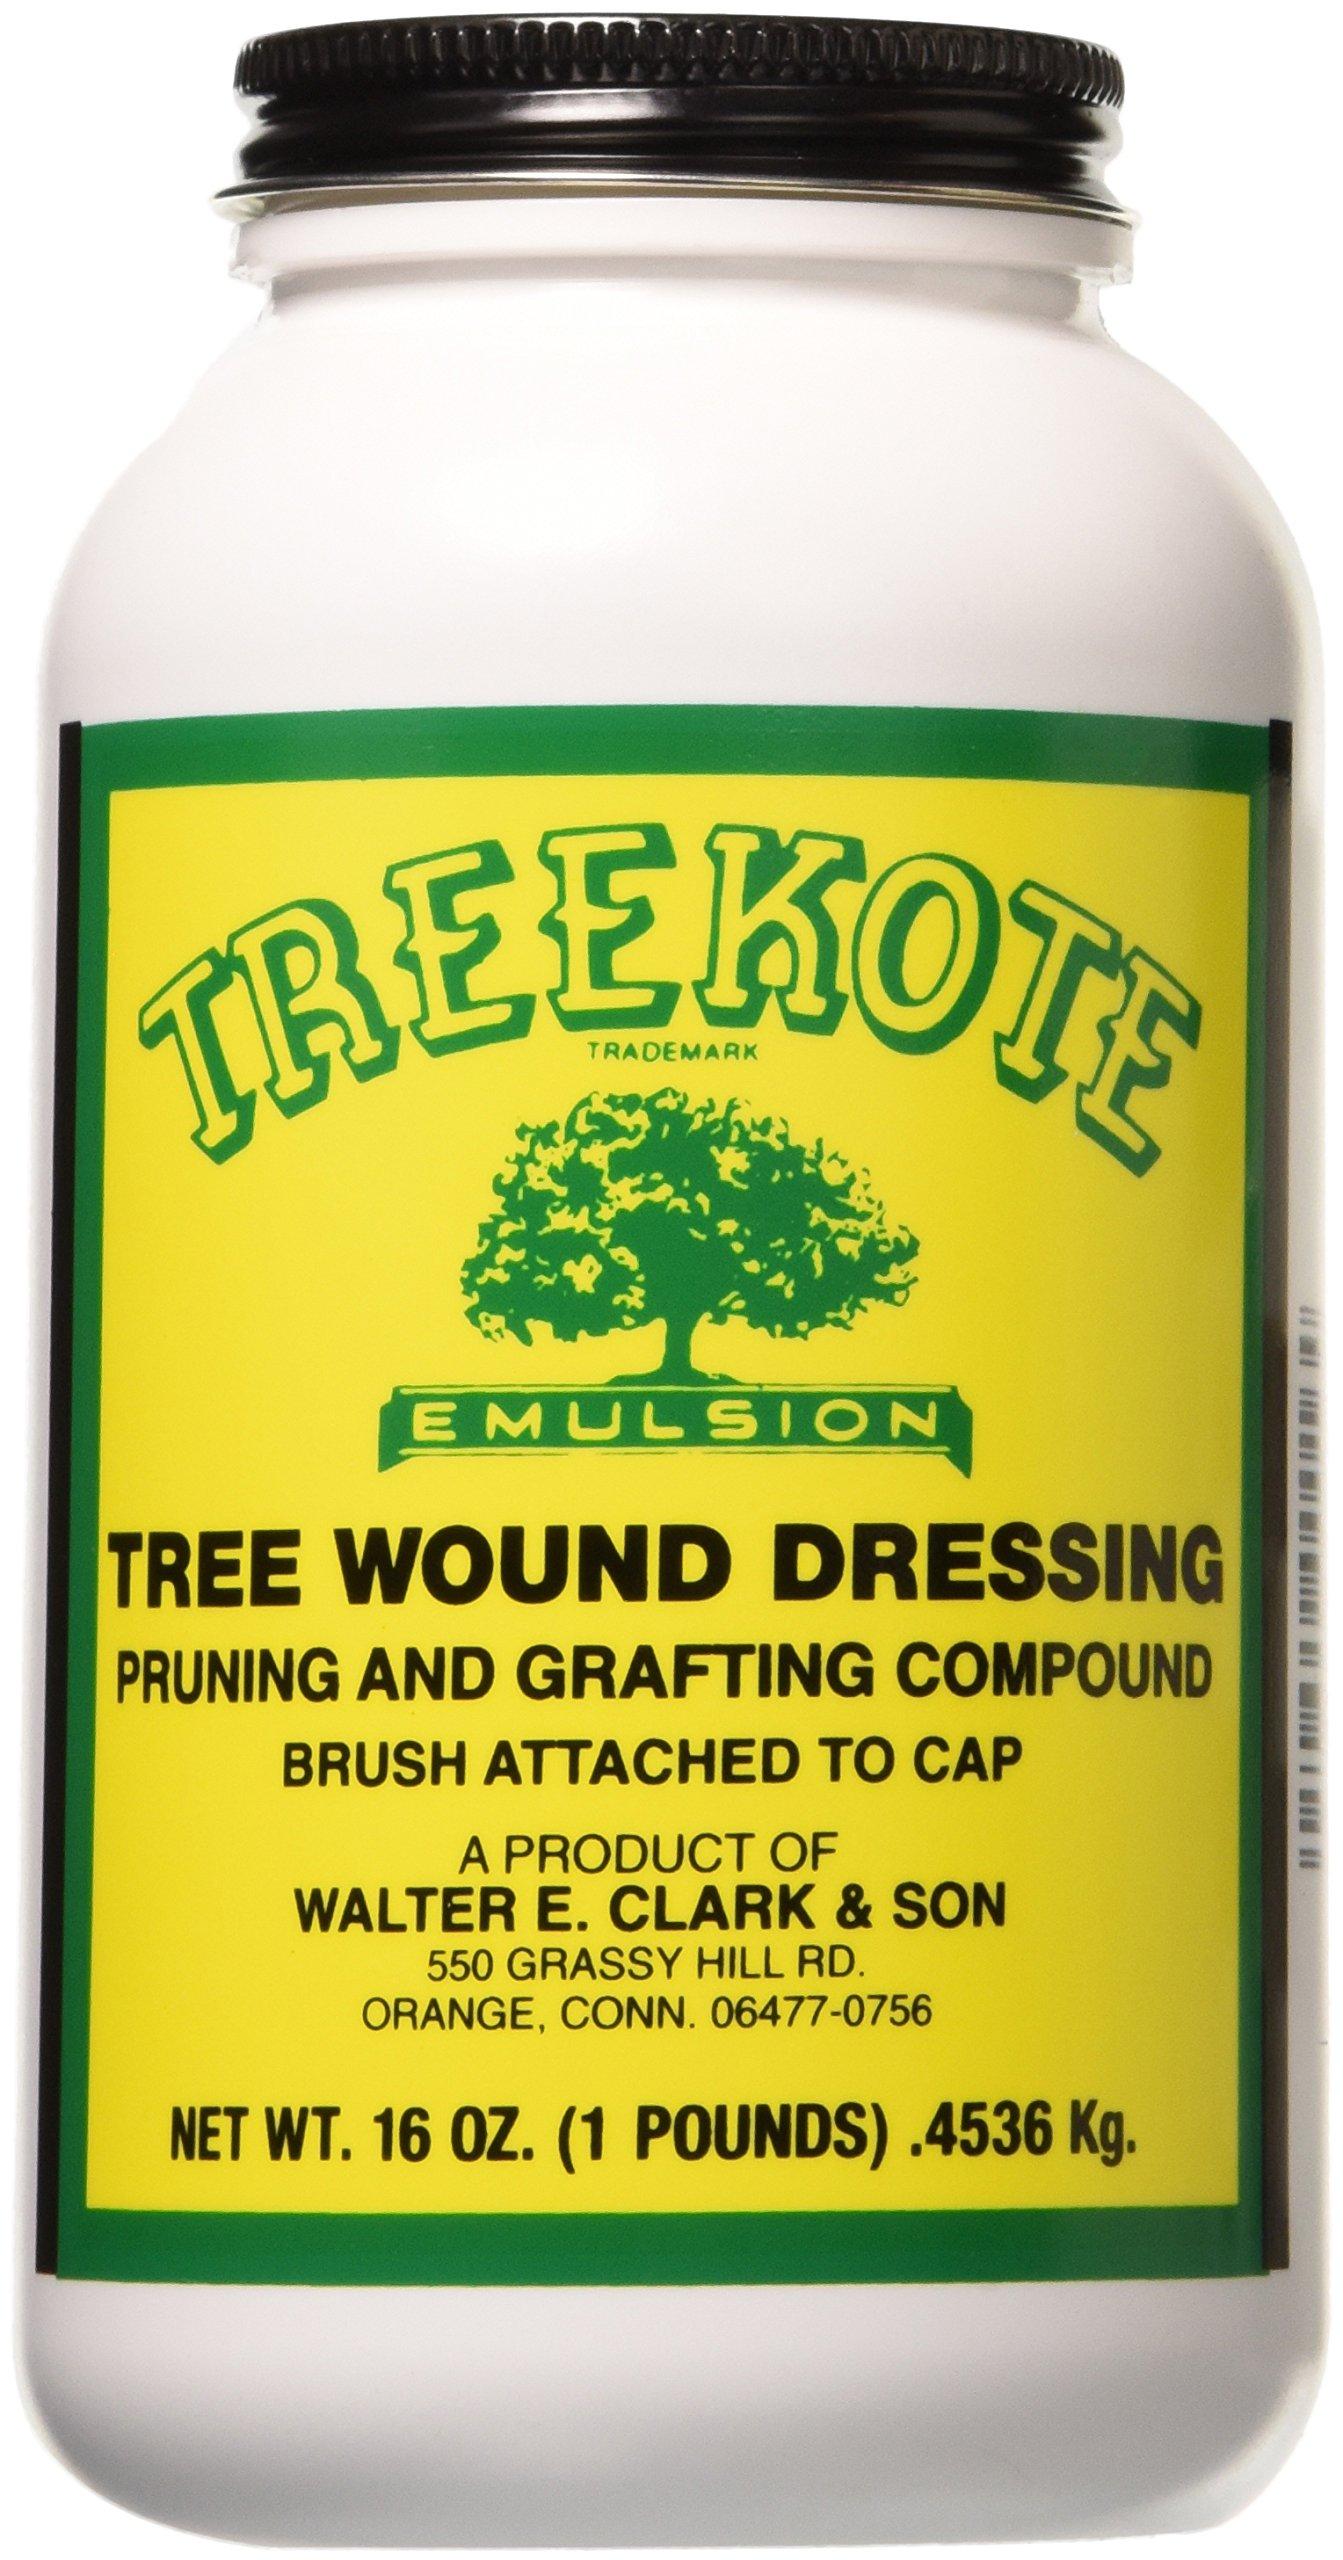 Walter E Clark Clarks 00016 Treekote Brushtop Container, 16-Ounce